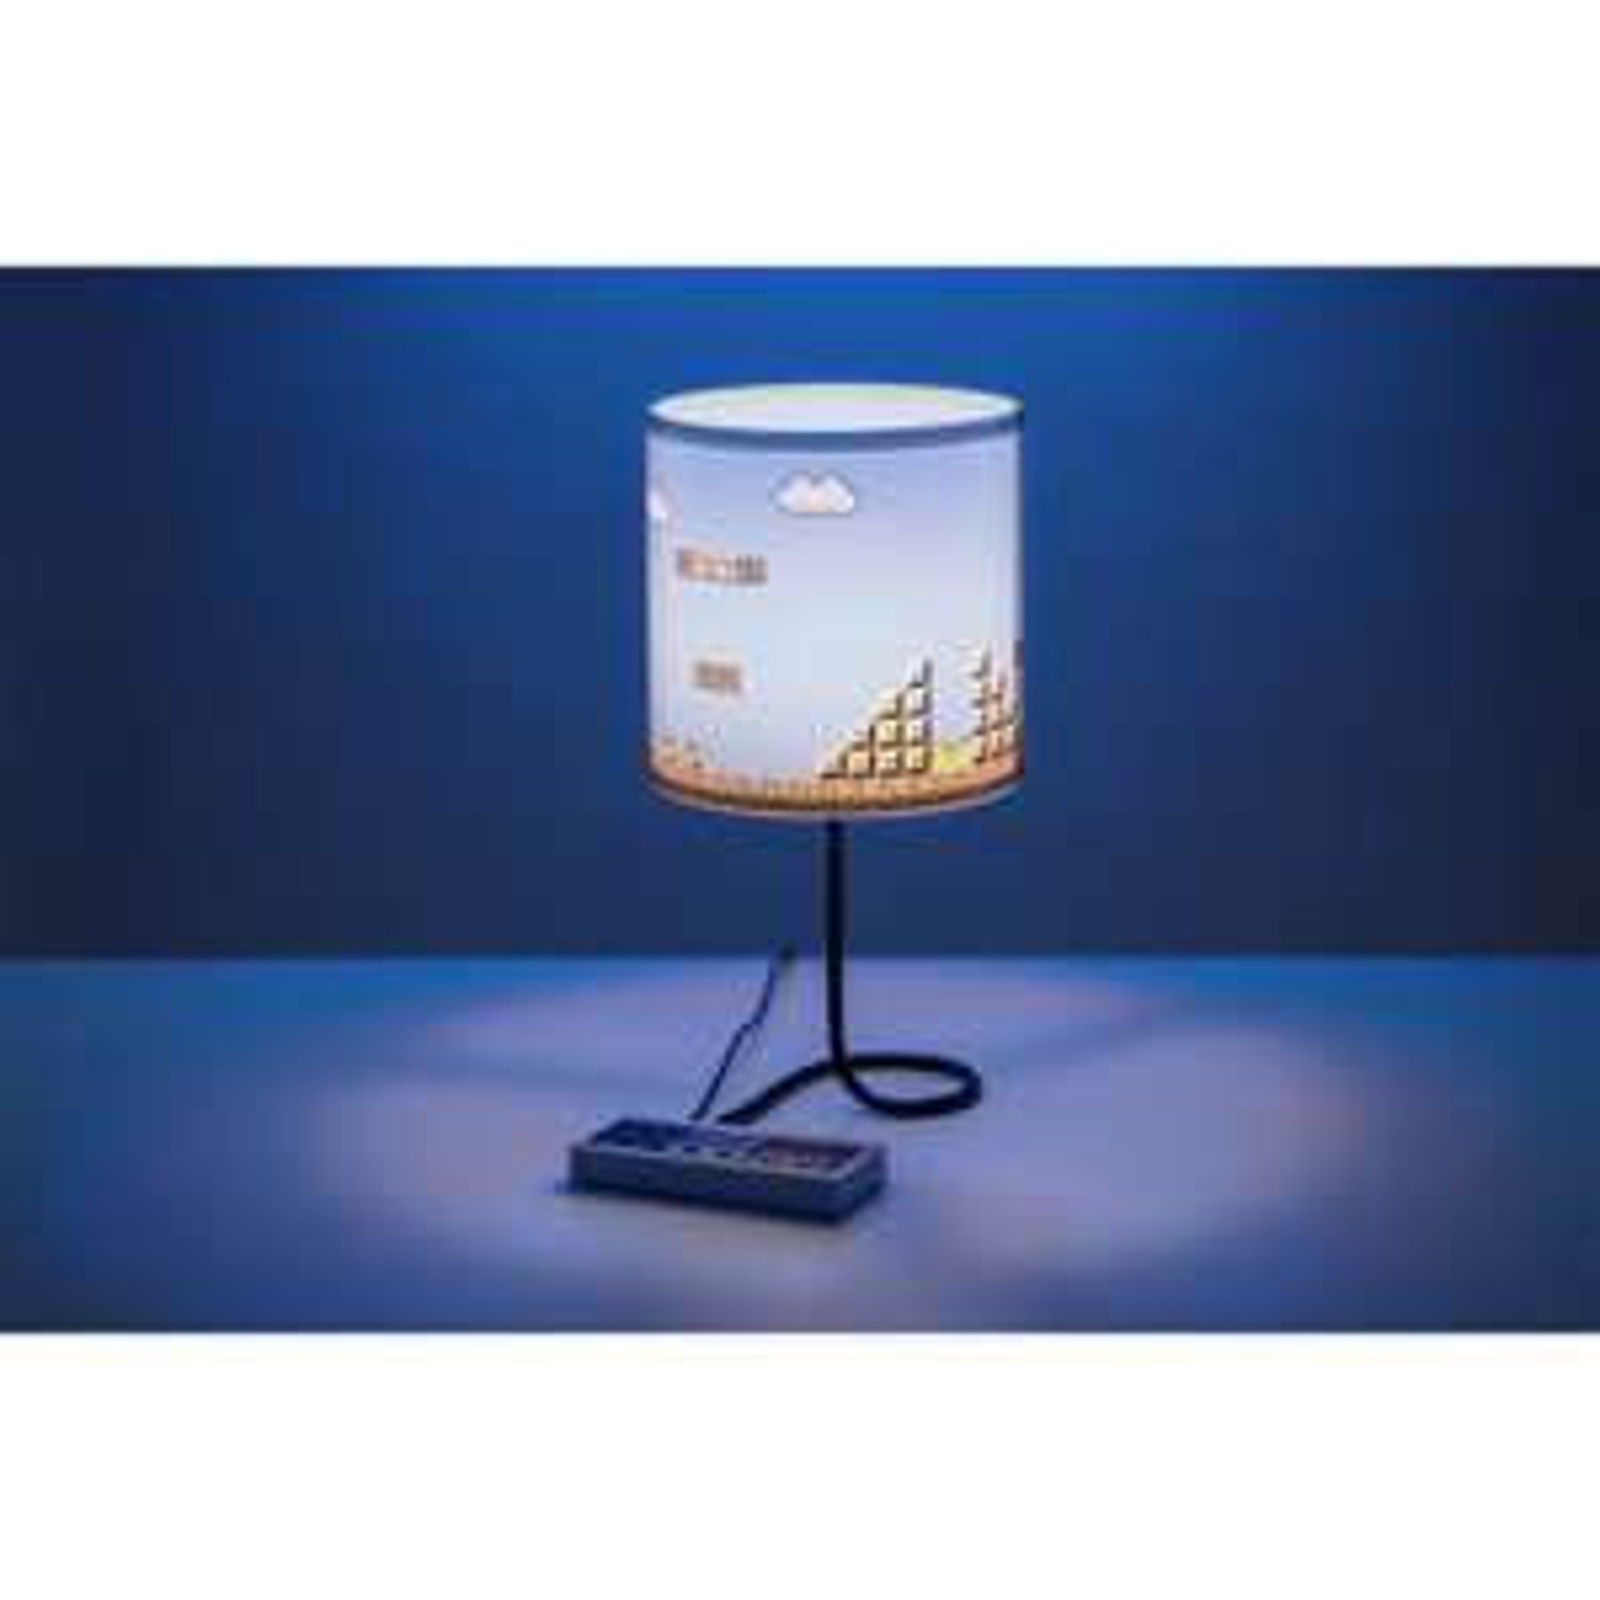 Nintendo NES Lampe für 27,90€ @ Zavvi